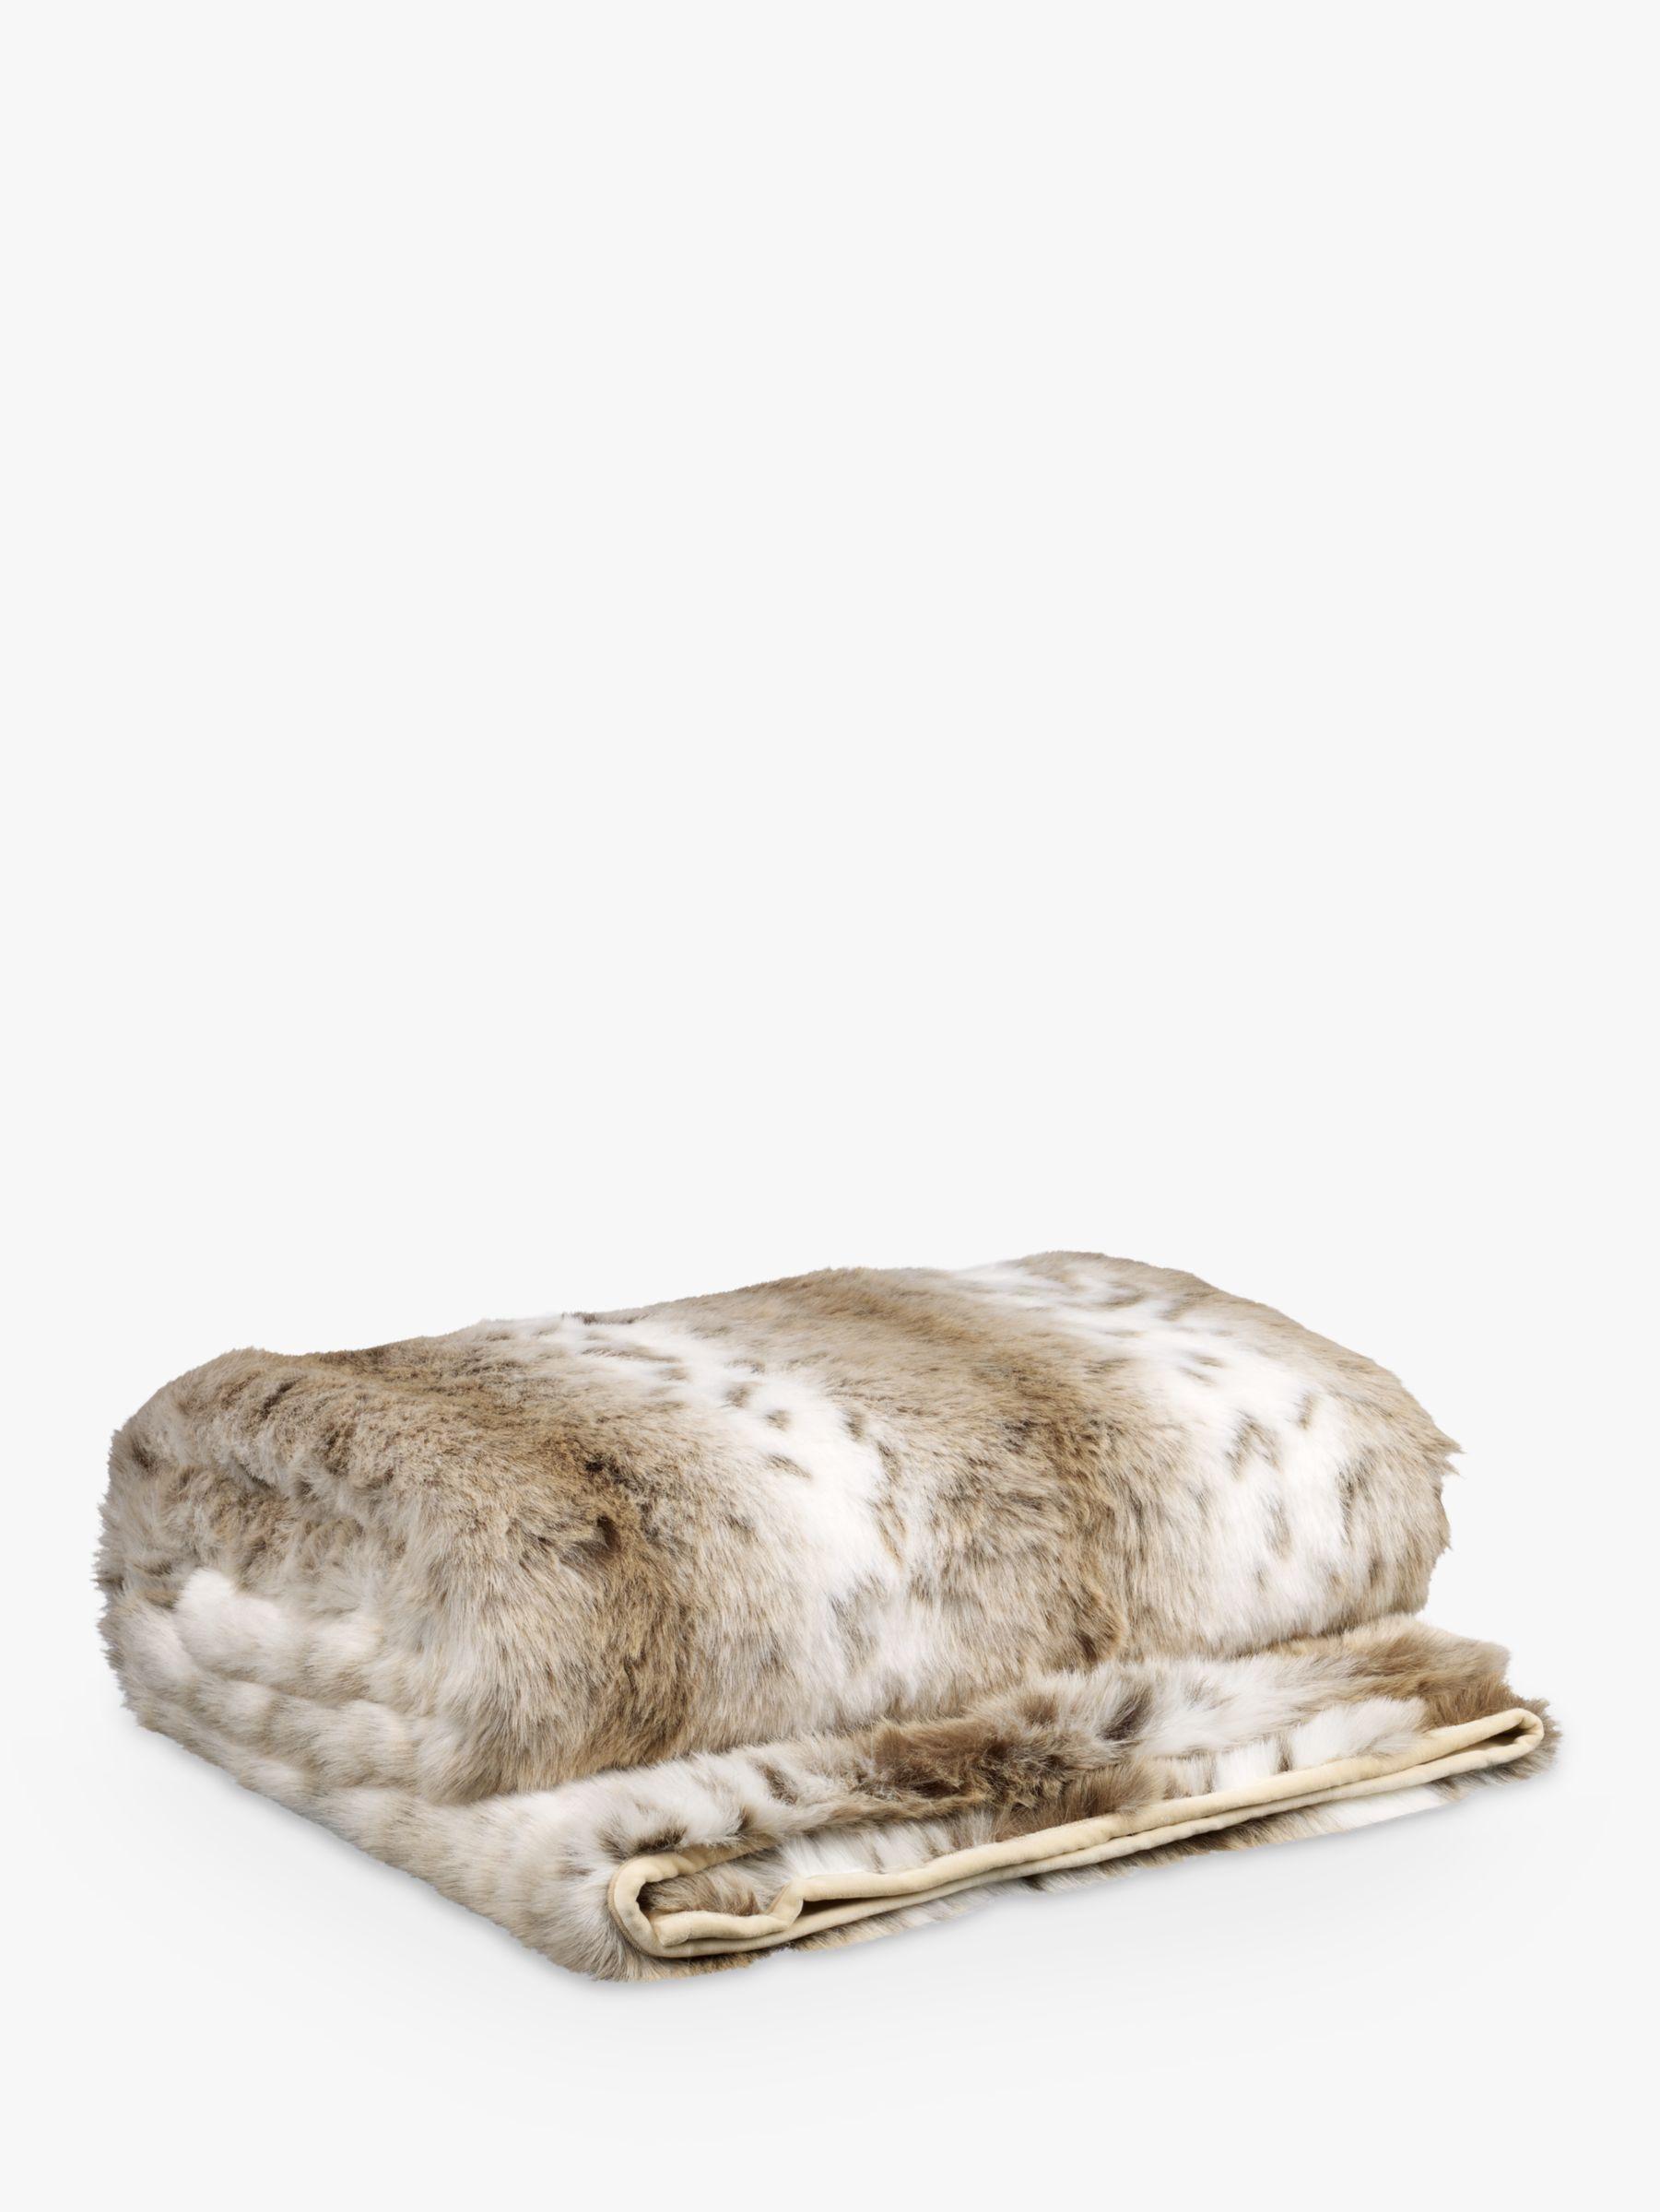 Helene Berman Helene Berman Faux Fur Spot Throw, Cream